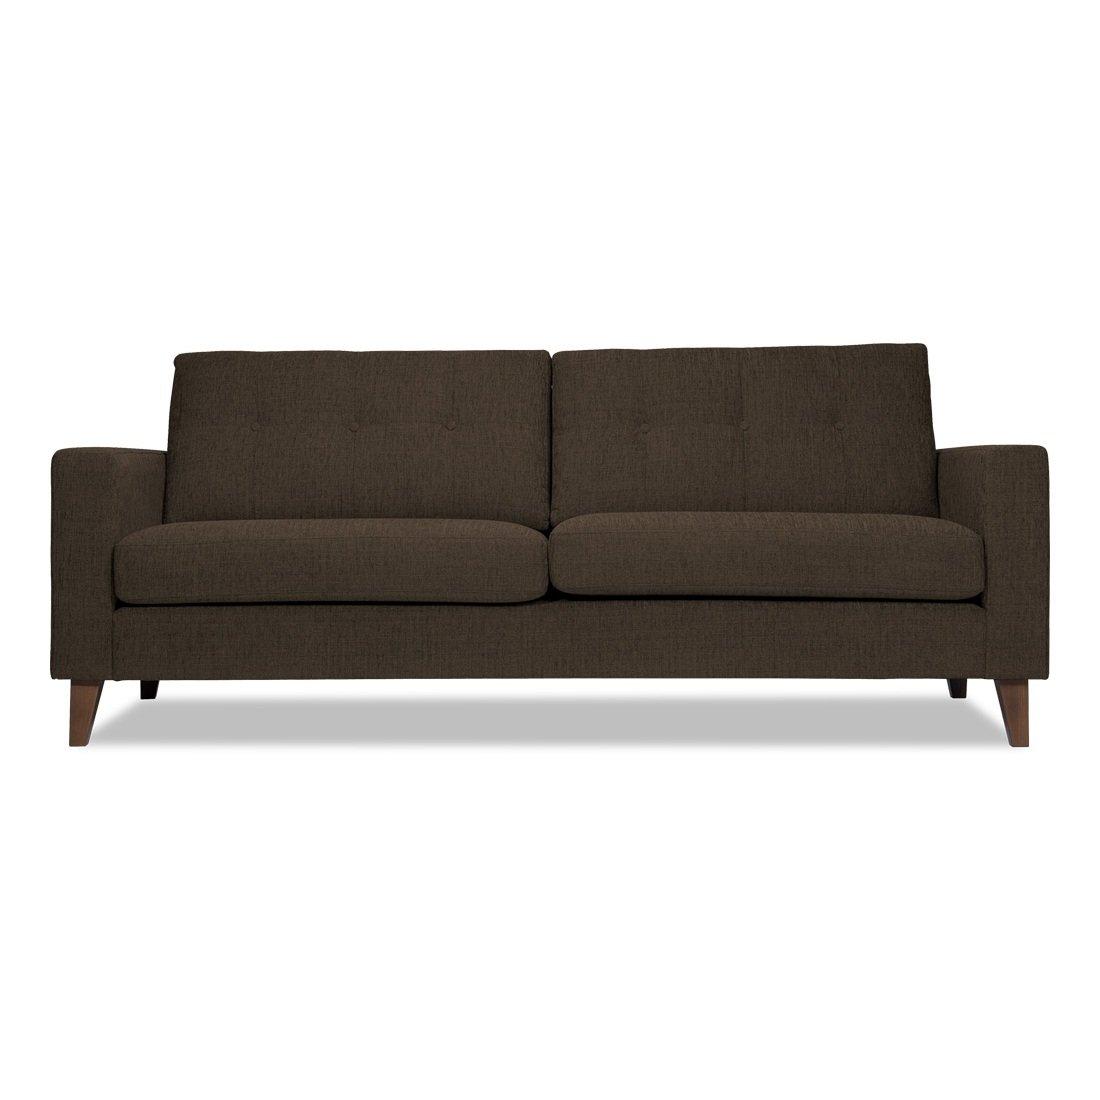 3-Sitzer Sofa Grau-Braun Designer Couch Sofa günstig